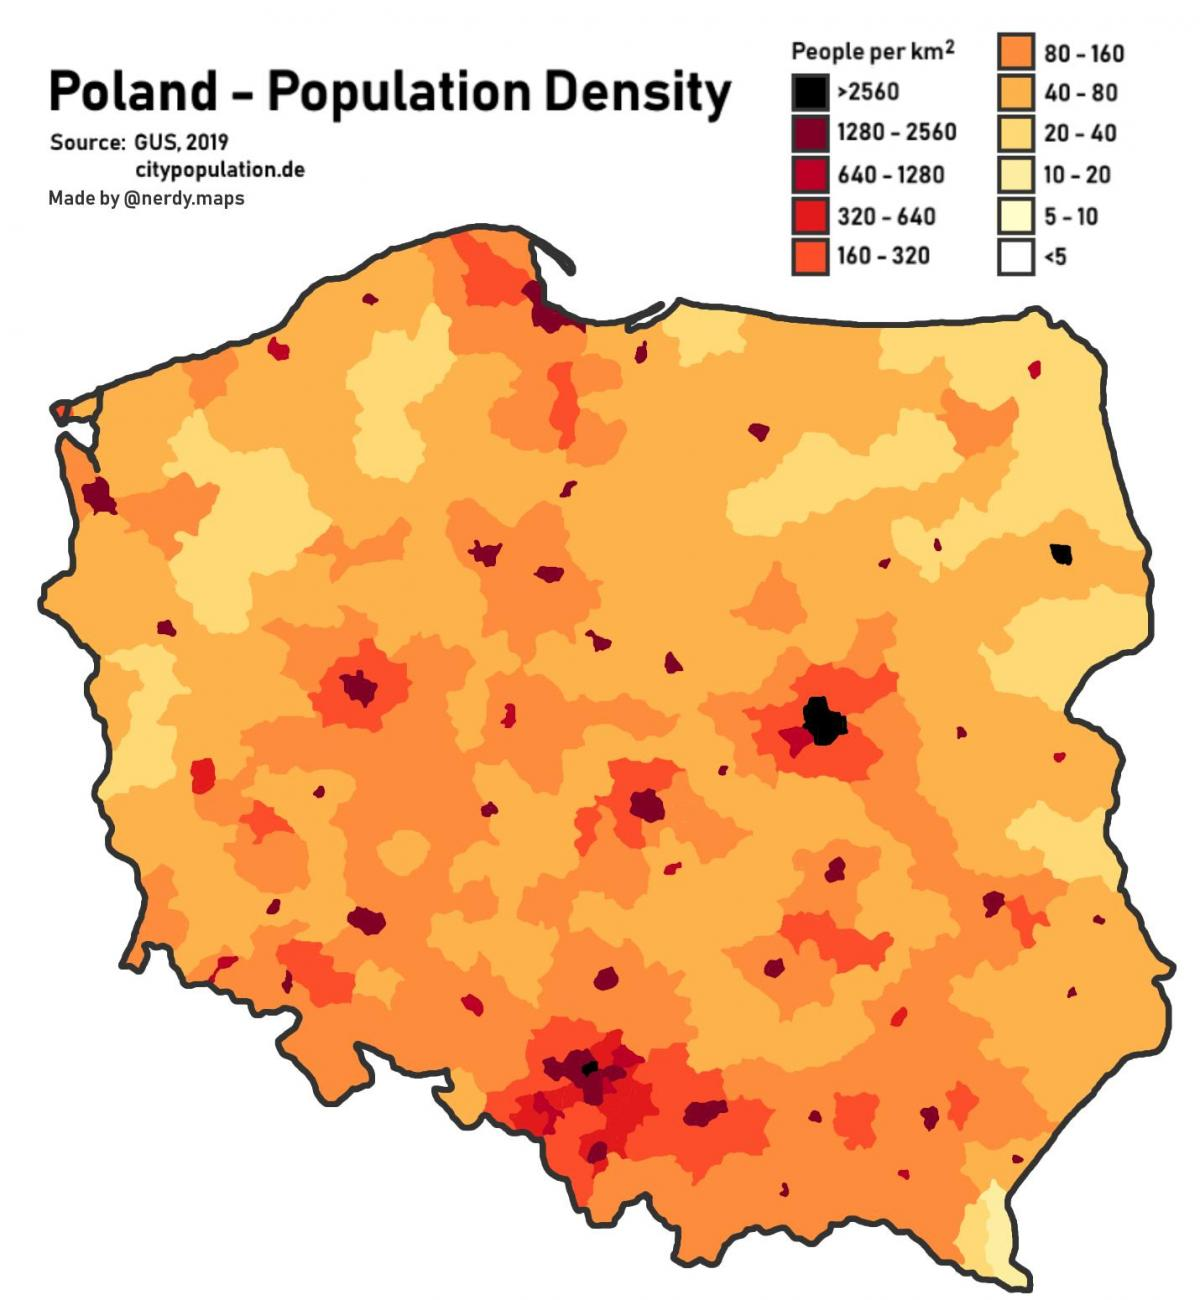 Puolan Vaestosta Kartta Kartta Puolan Vaestosta Ita Eurooppa